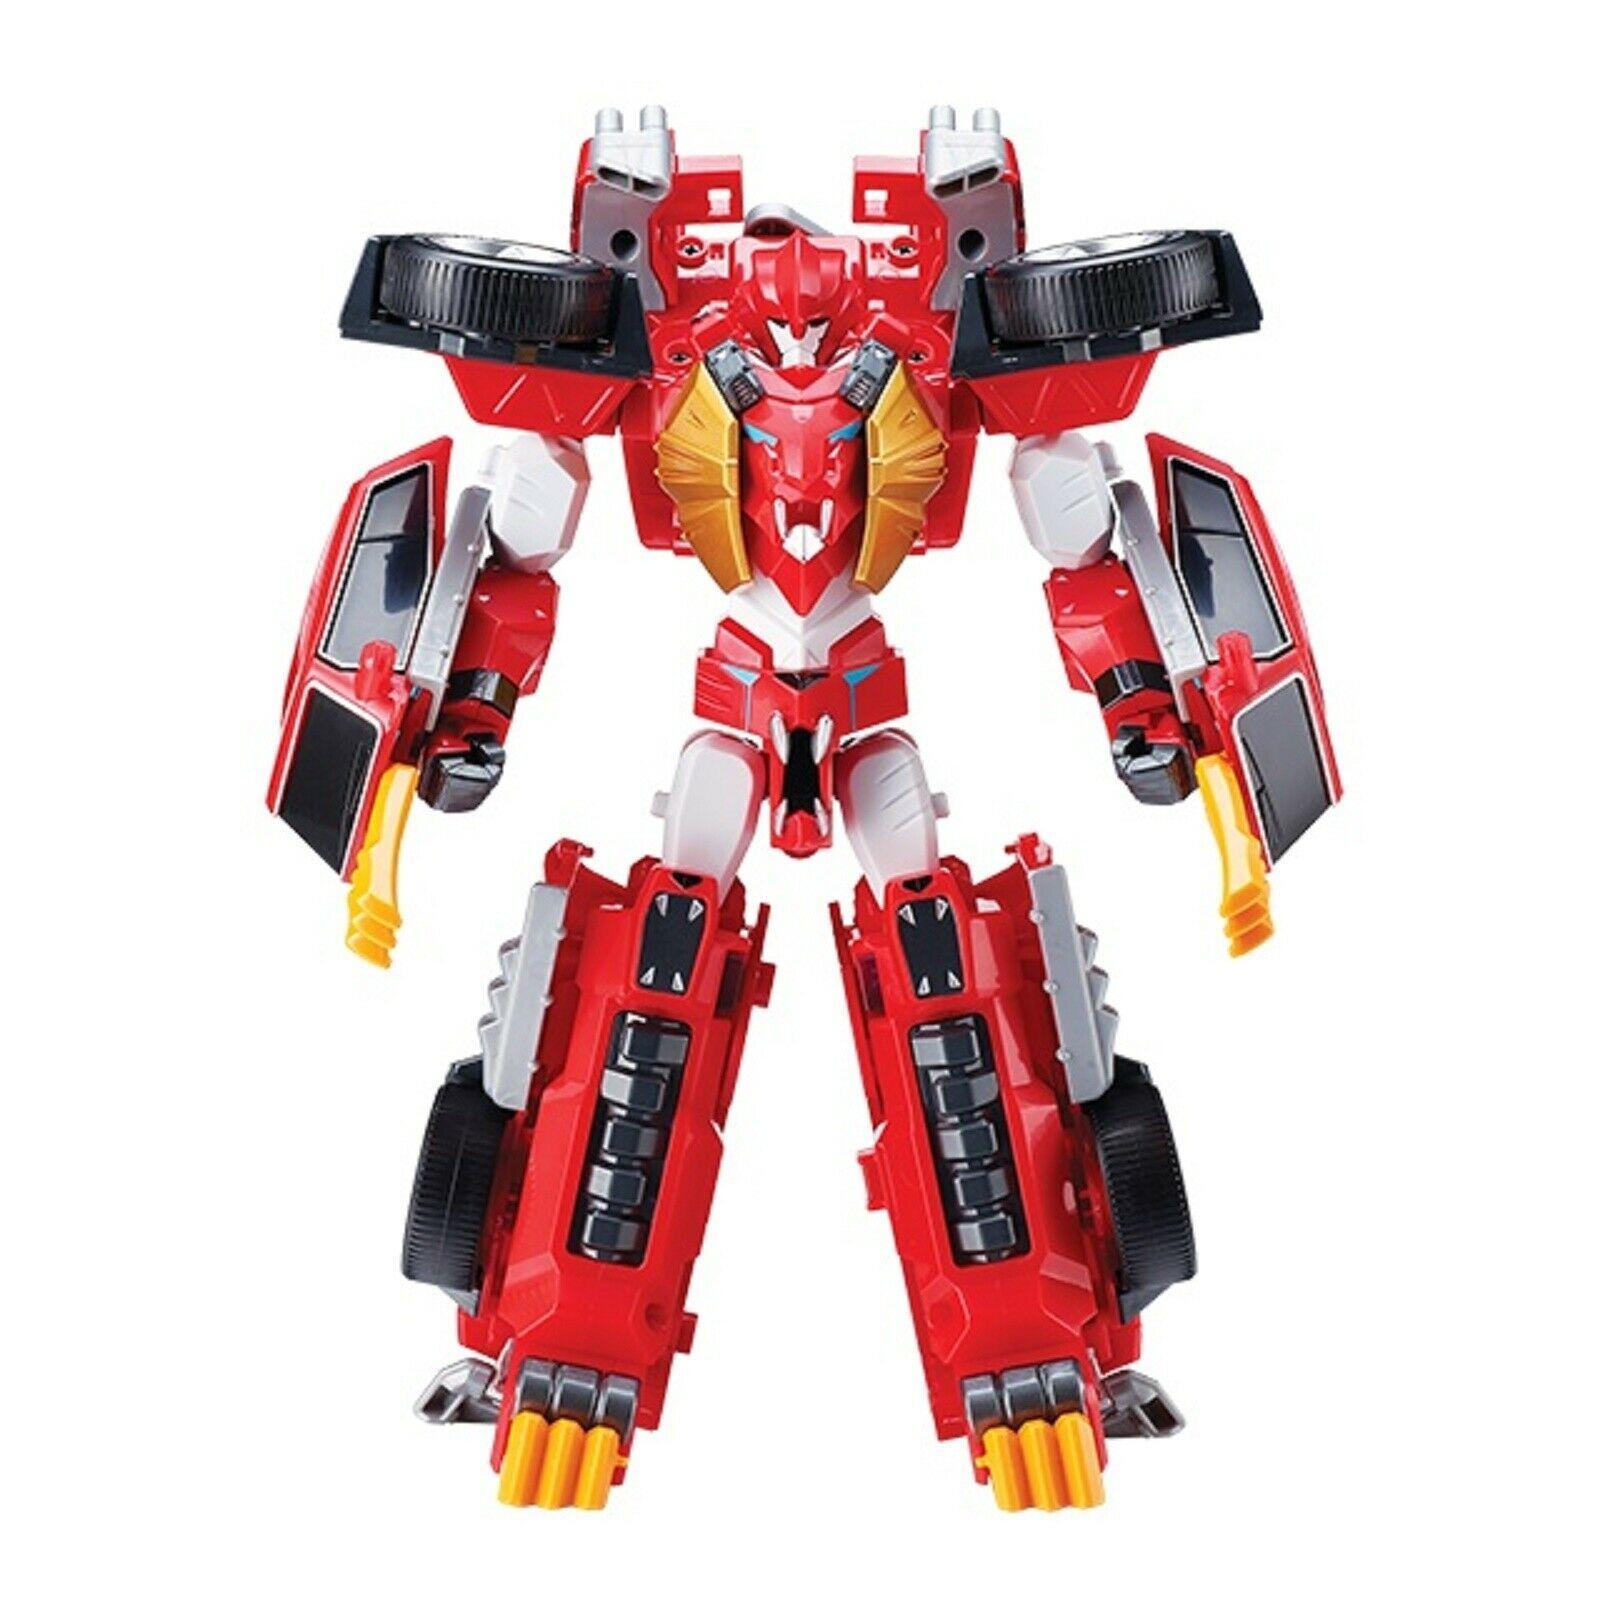 Tobot Leo Kaiser Transformation Action Figure Toy Robot